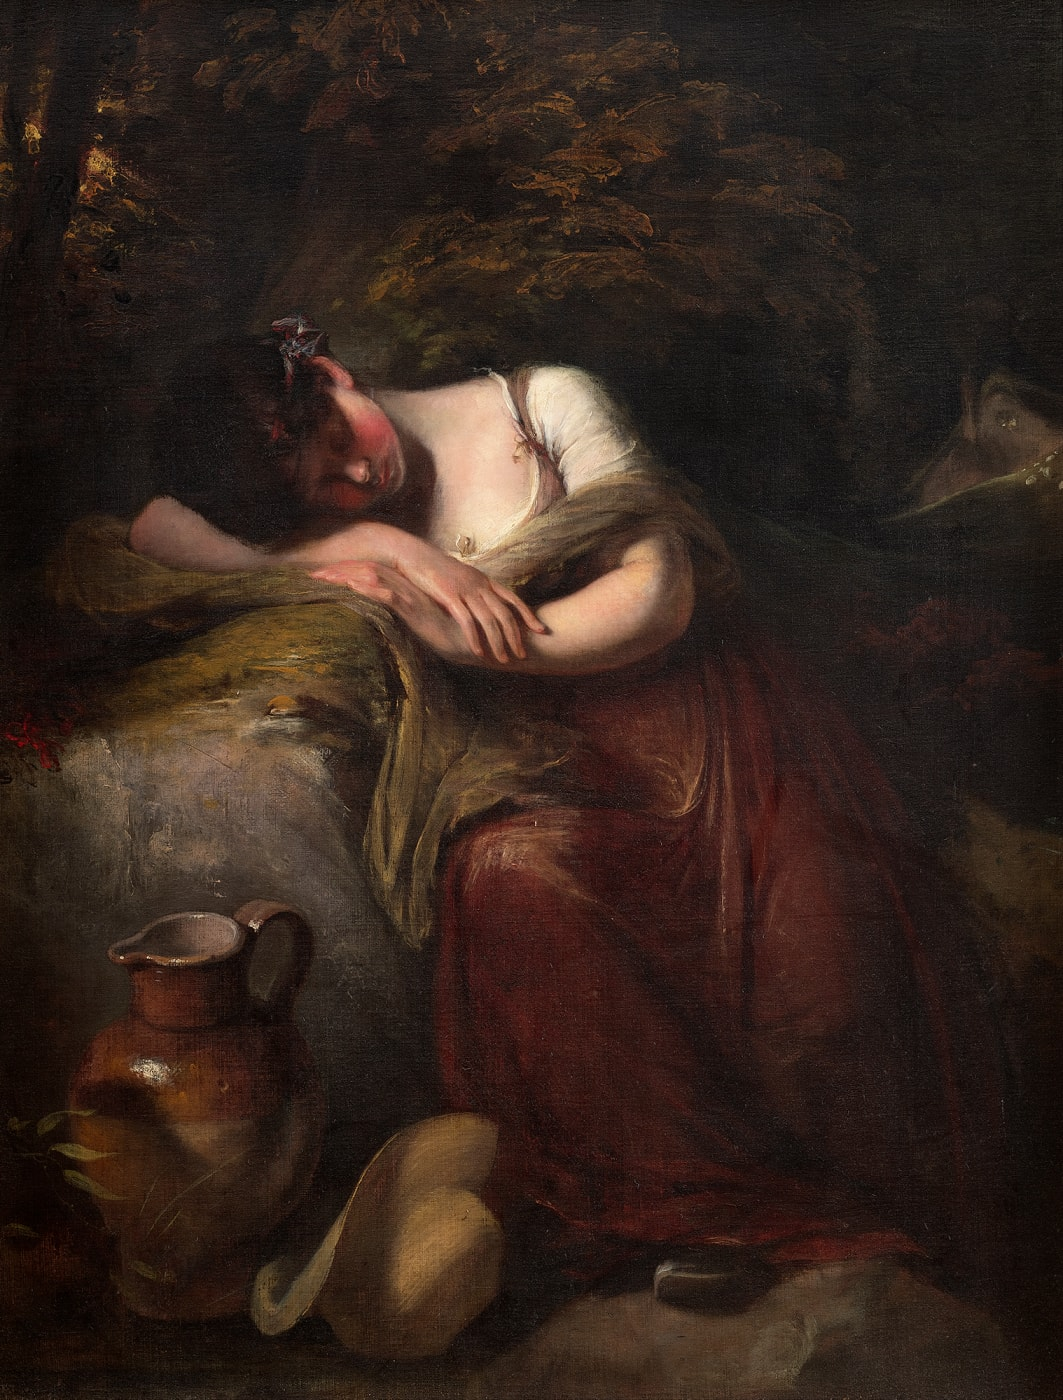 sleeping girl by John Opie